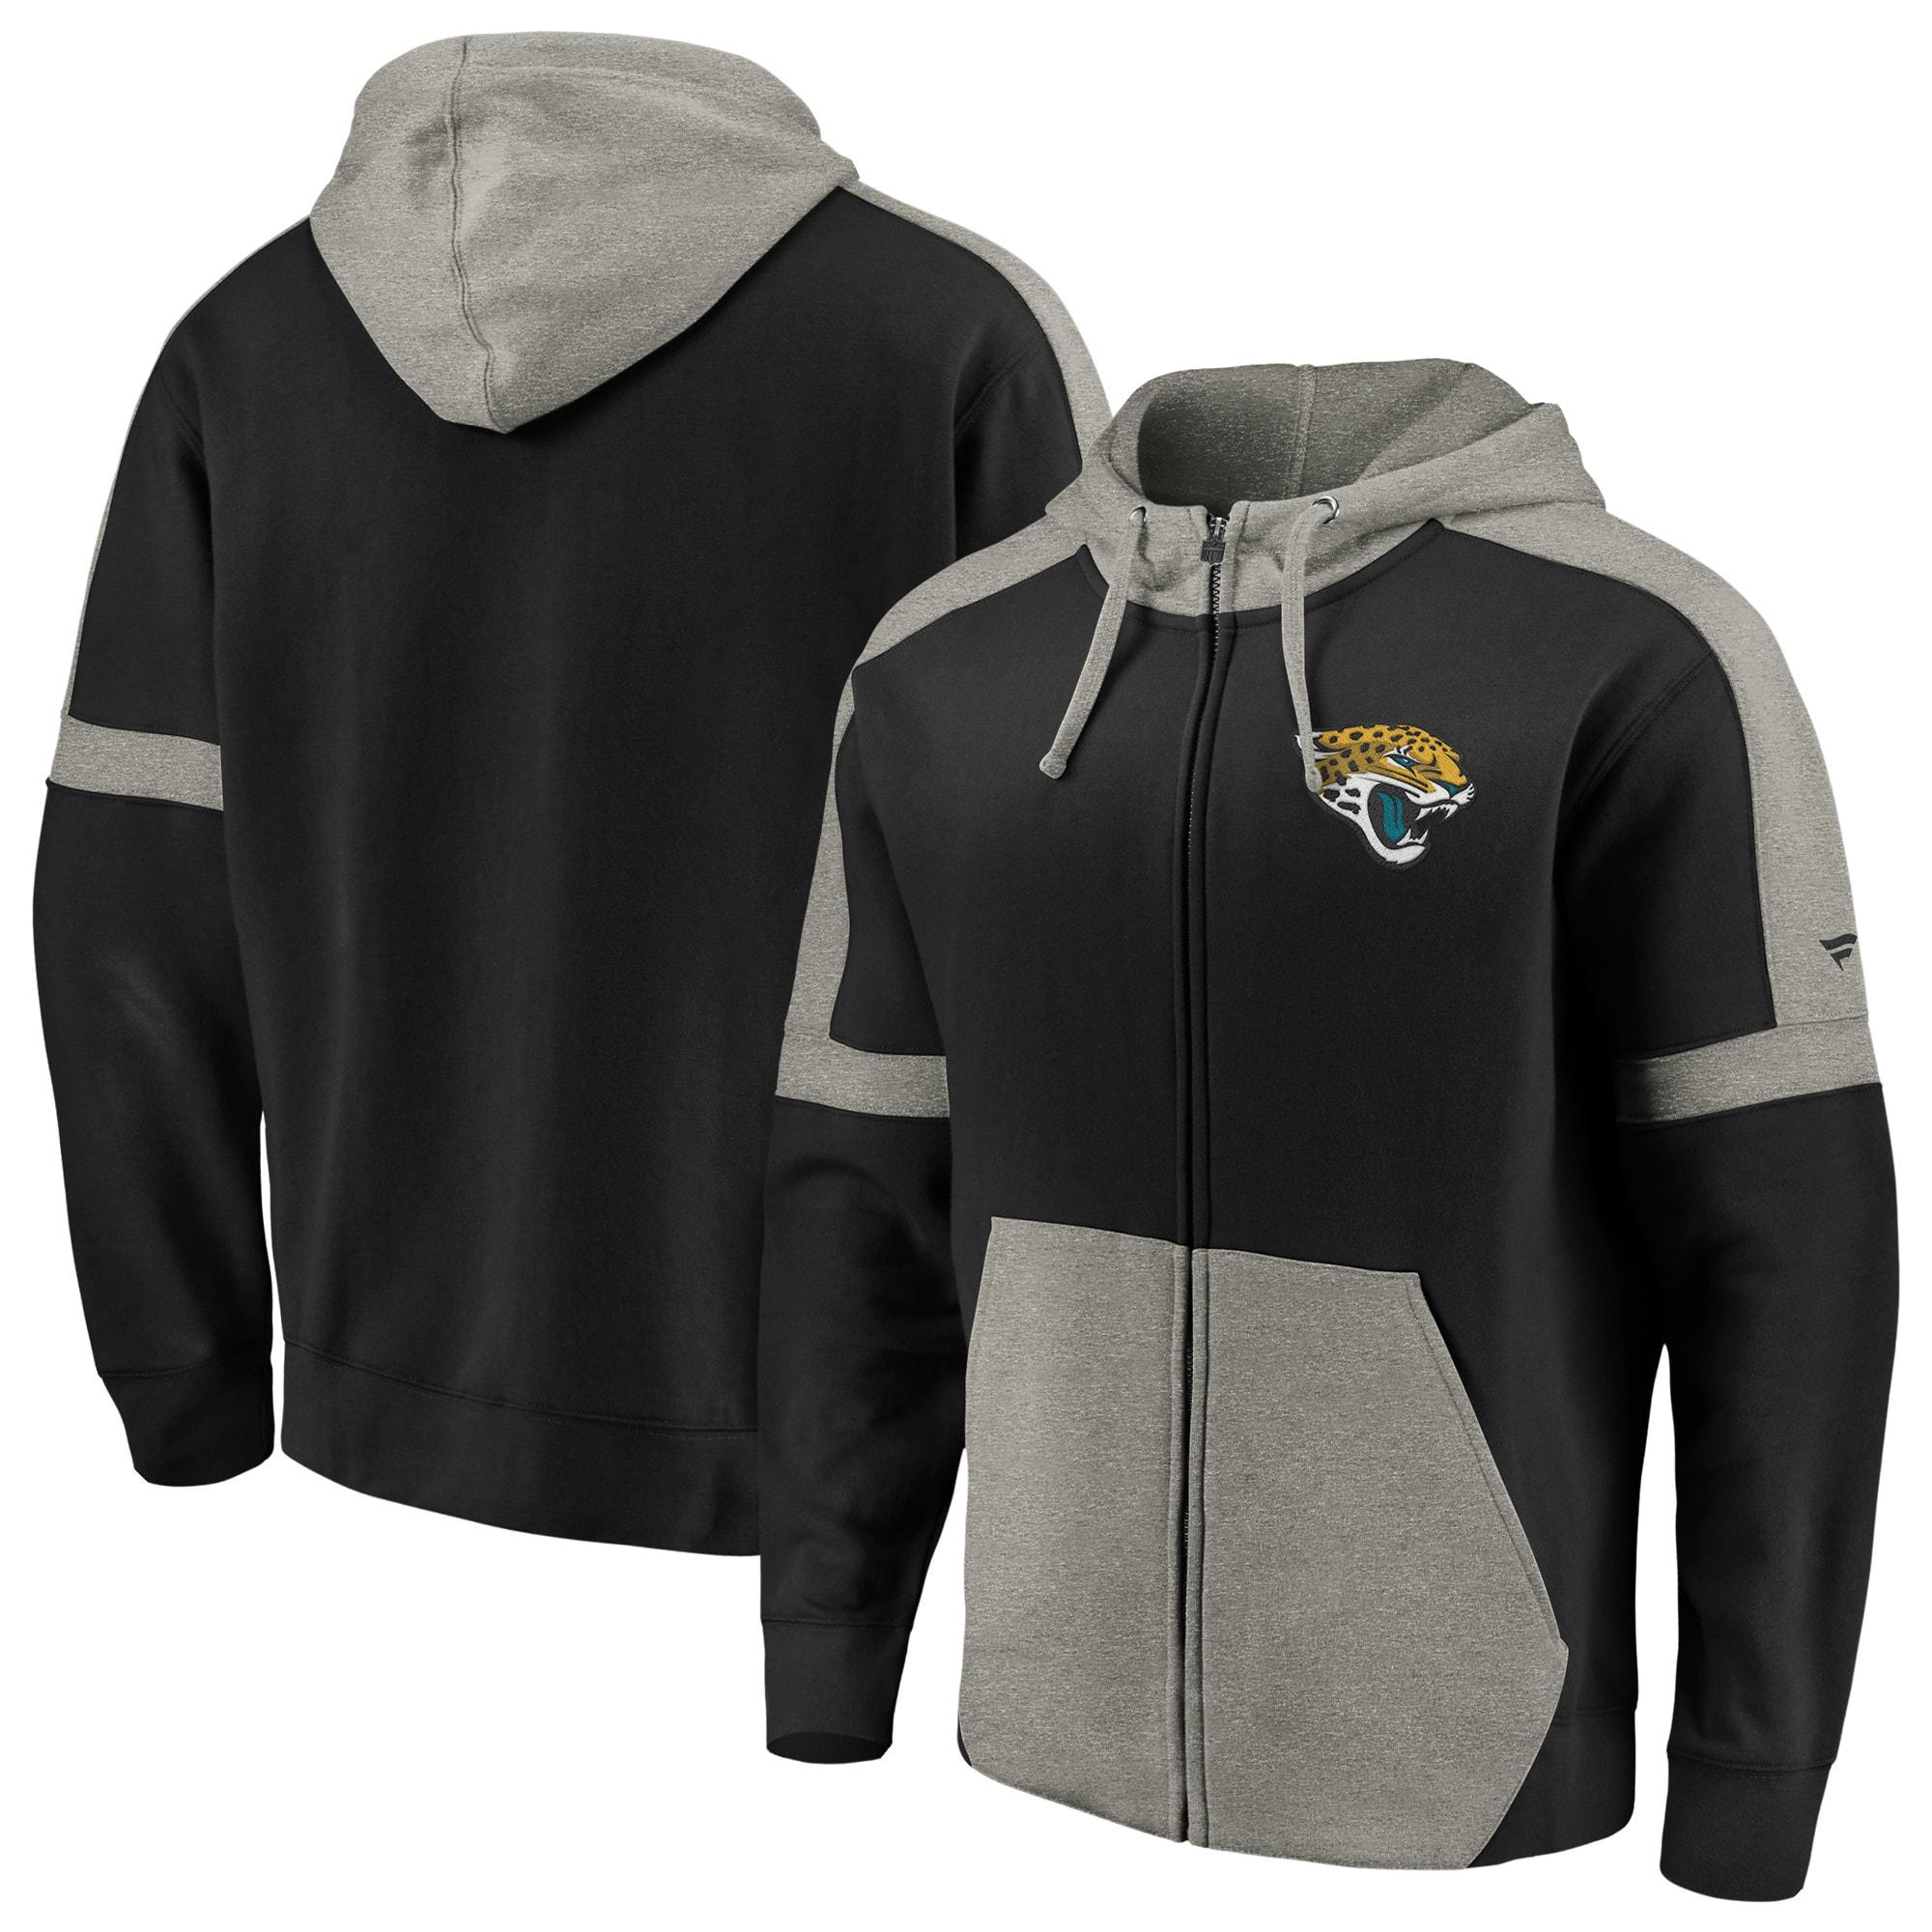 Jacksonville Jaguars NFL Pro Line by Fanatics Branded Big & Tall Iconic Full-Zip Hoodie - Black/Heathered Gray